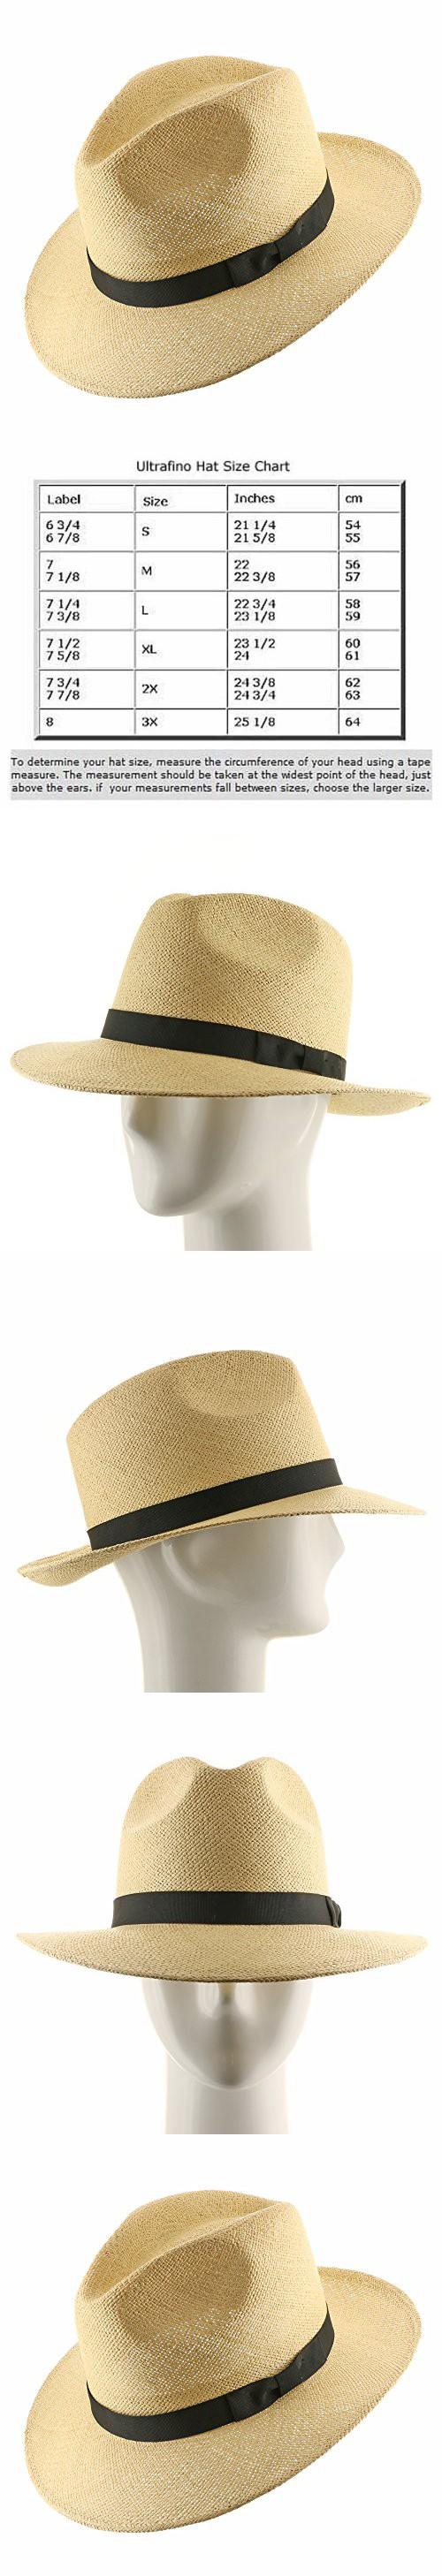 FEDORA PACKABLE FOLDABLE Panama Straw Hat CLASSIC 7 1 4 Fedoras b62305ca918